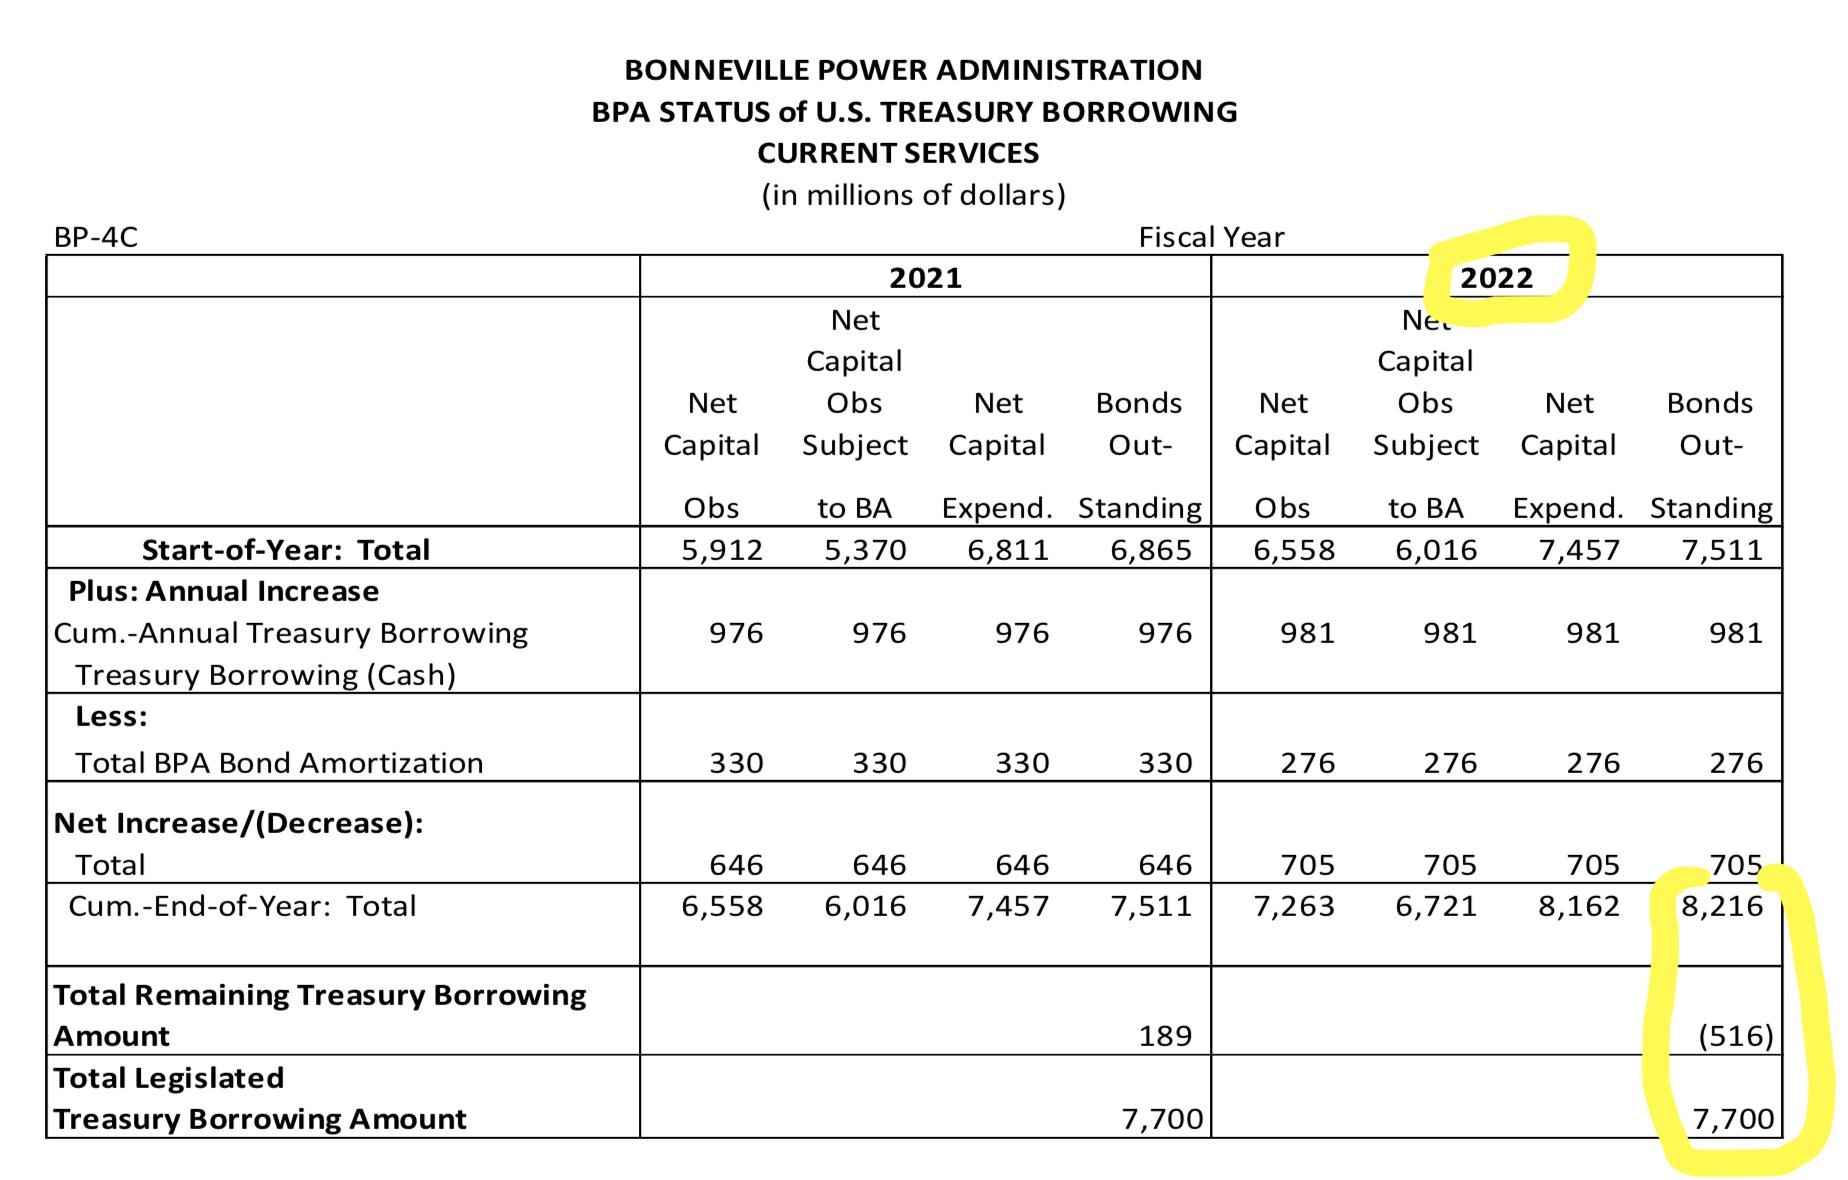 BPA_Borrowing_Authority_2022